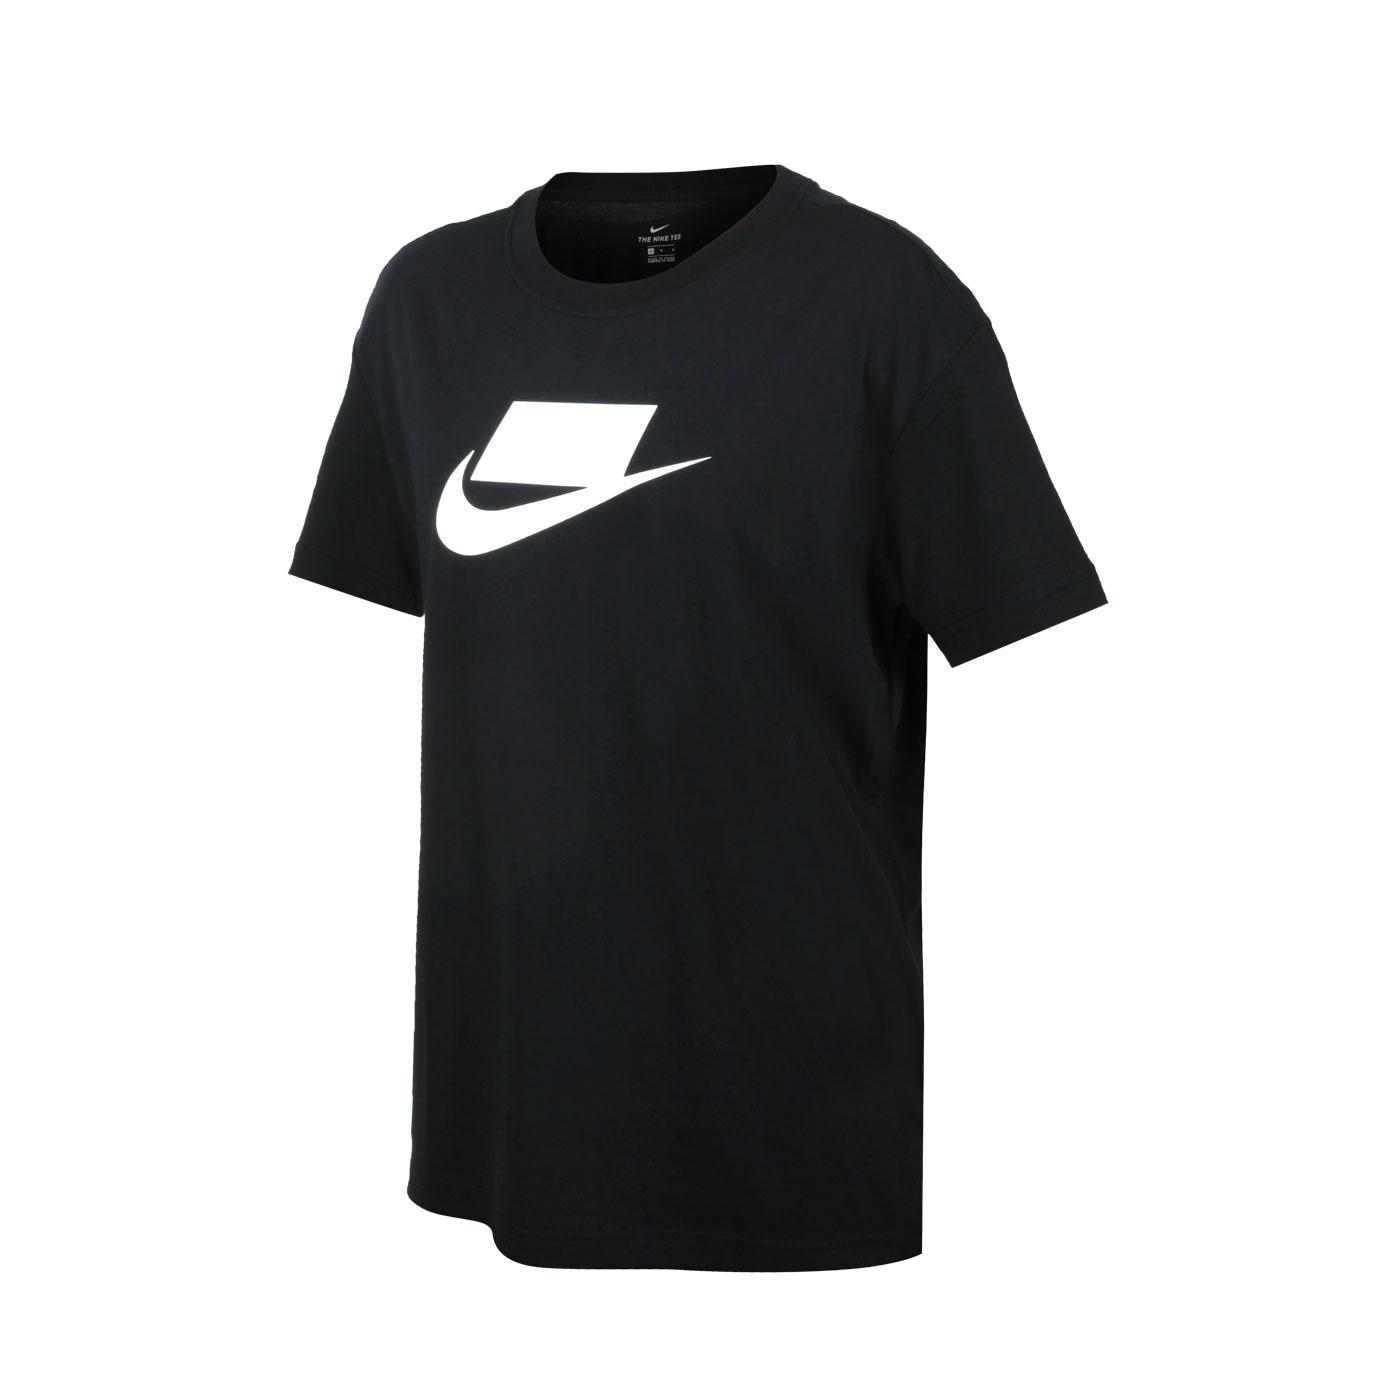 NIKE 女款短袖T恤 DB9828-010